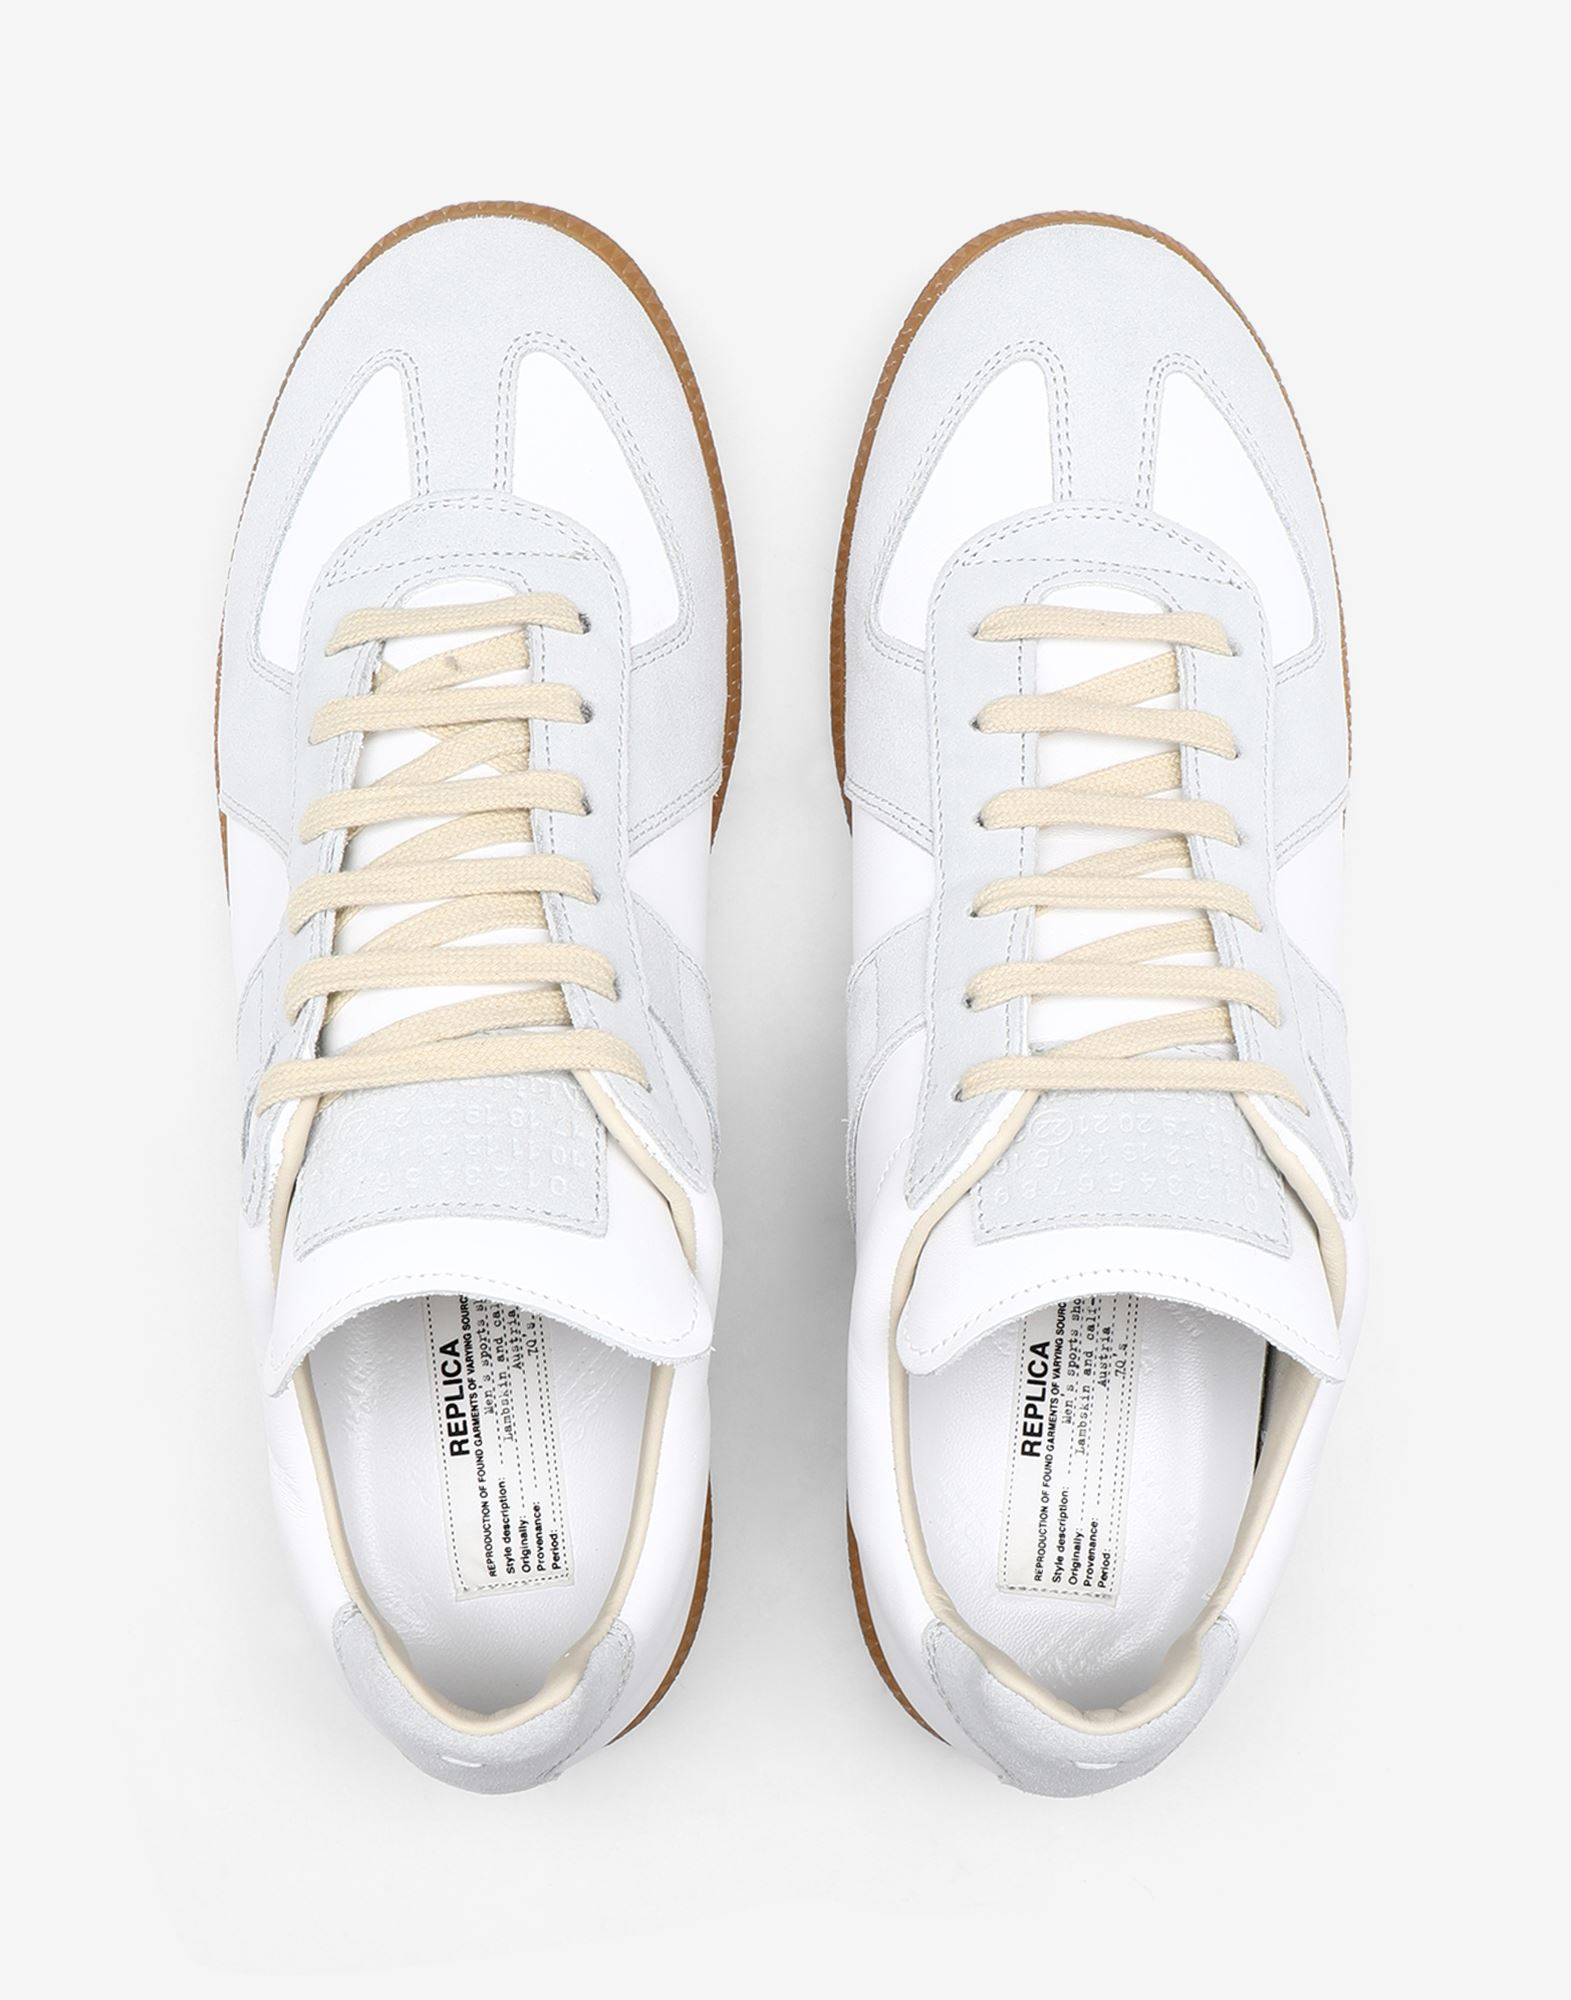 MAISON MARGIELA Calfskin 'Replica' sneakers Sneakers Man a